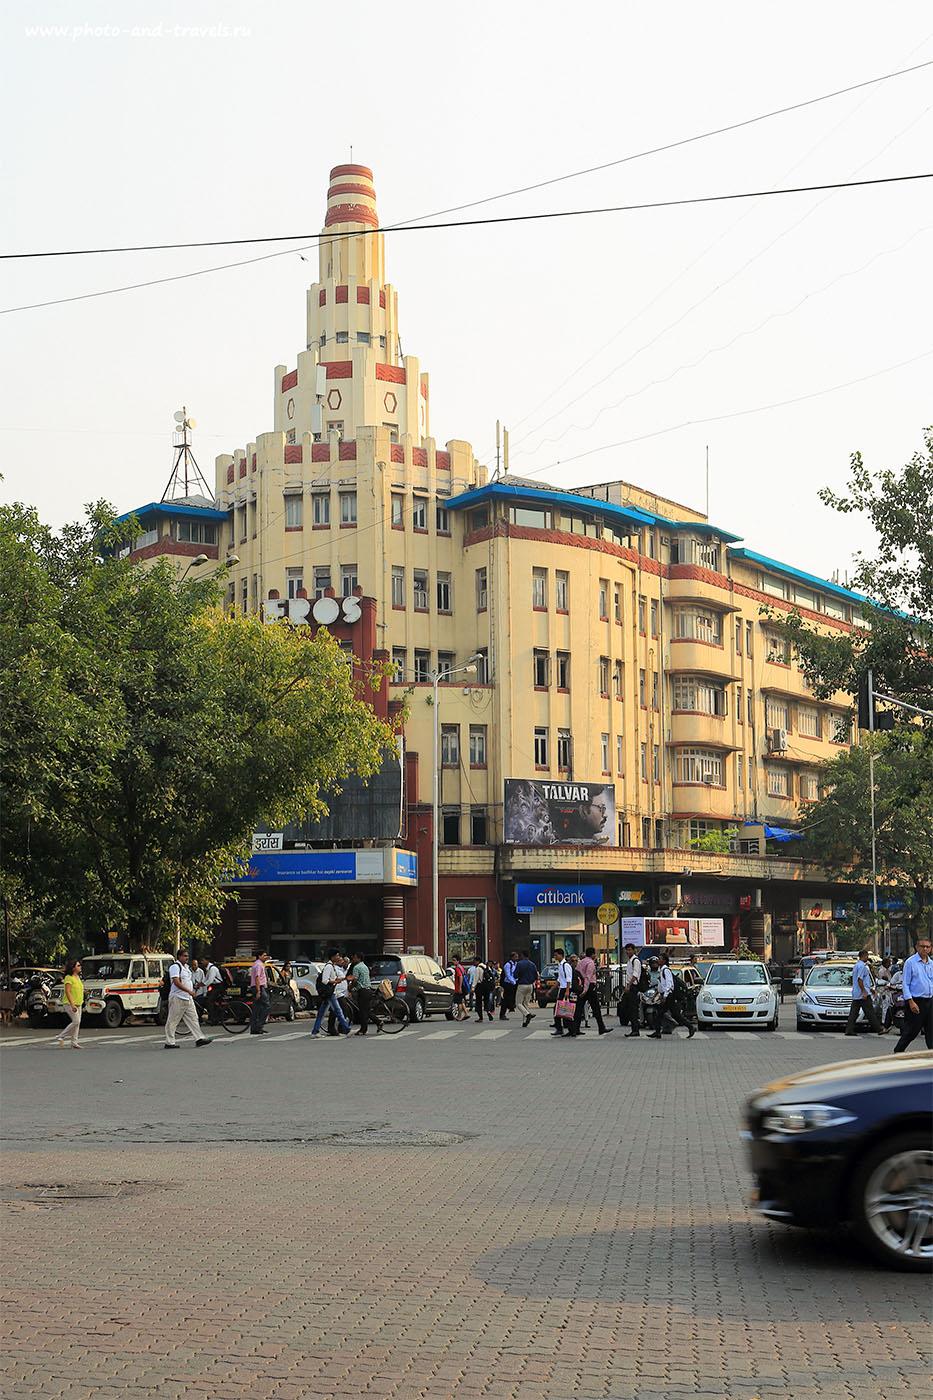 29. Кинотеатр «Eros» в Мумбаи (24-70, 1/80, 0eV, f9, 39 mm, ISO 100)